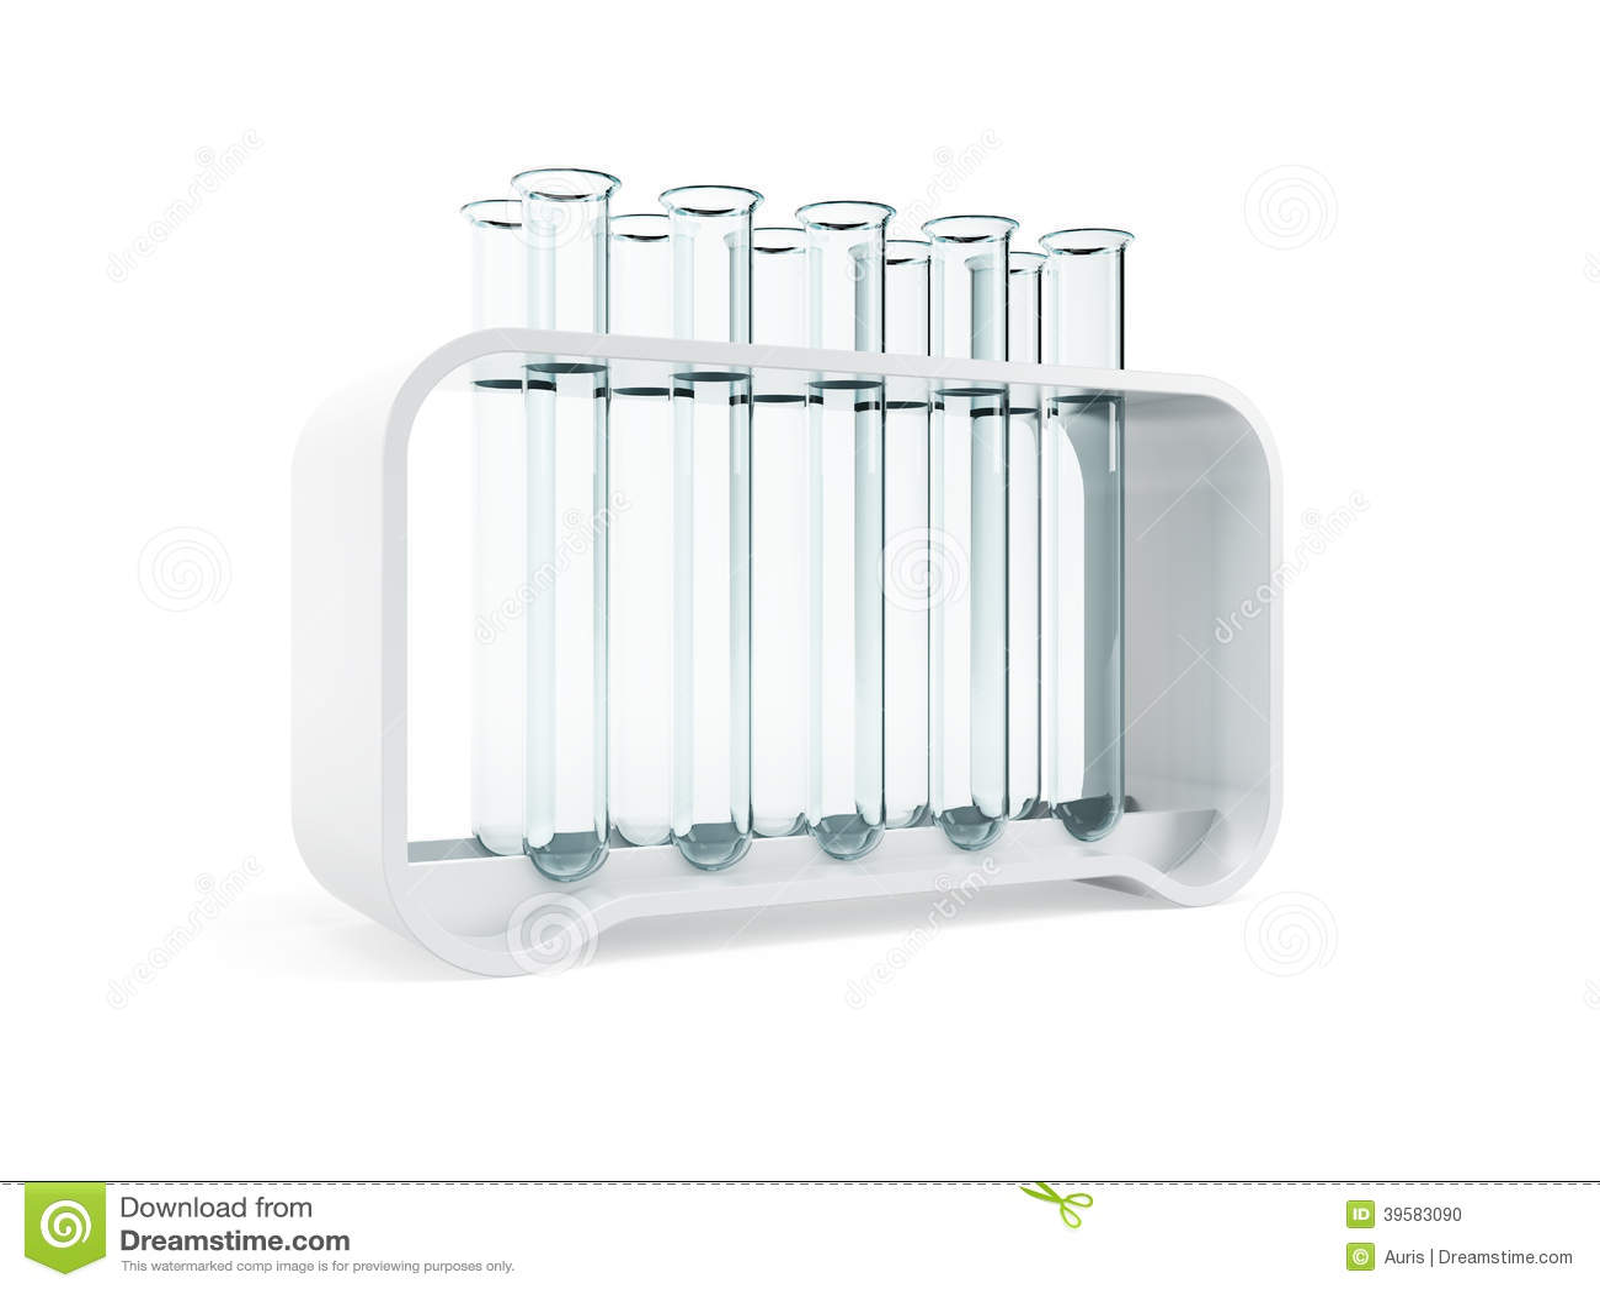 Empty test tubes